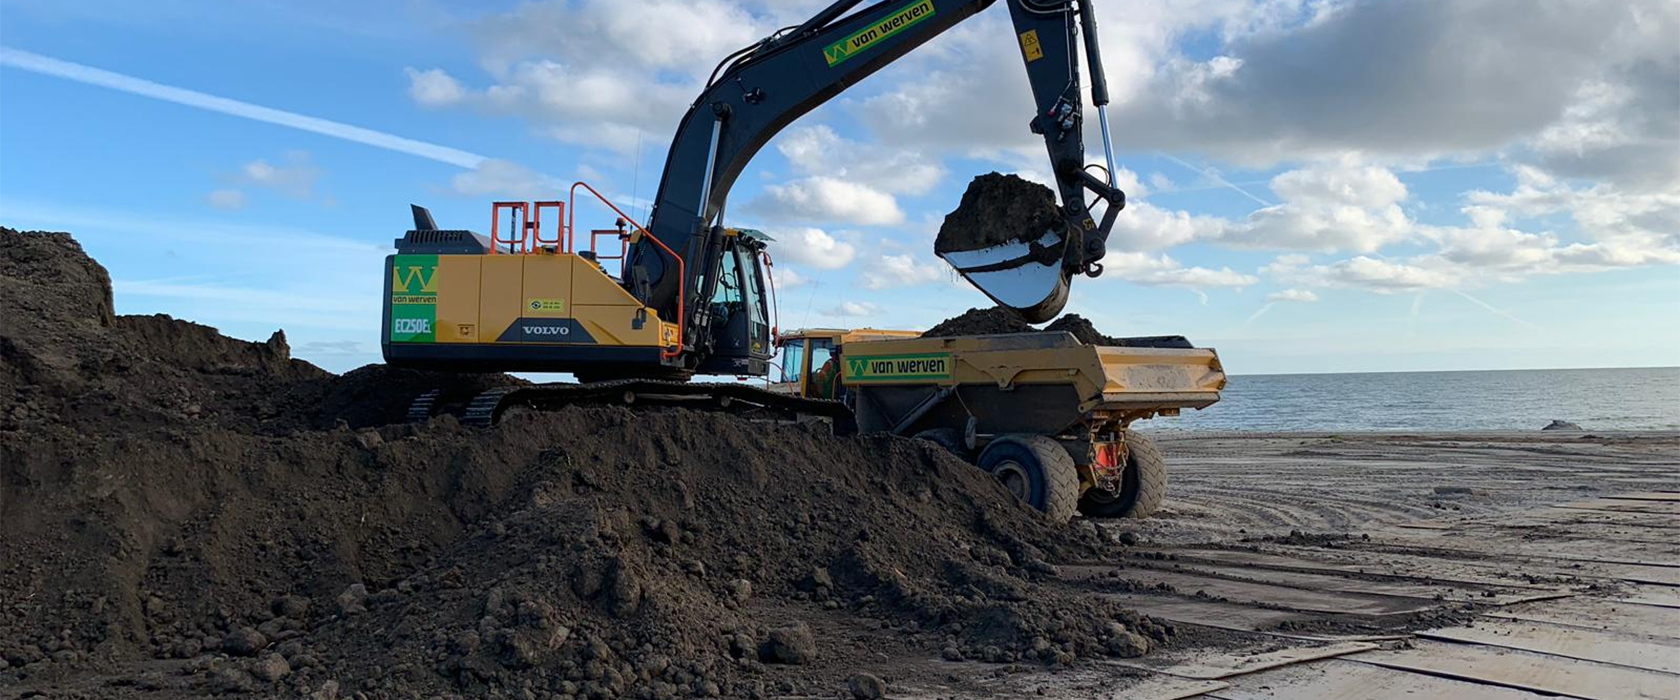 Aangepast handelingskader voor hergebruik van PFAS-houdende grond en baggerspecie